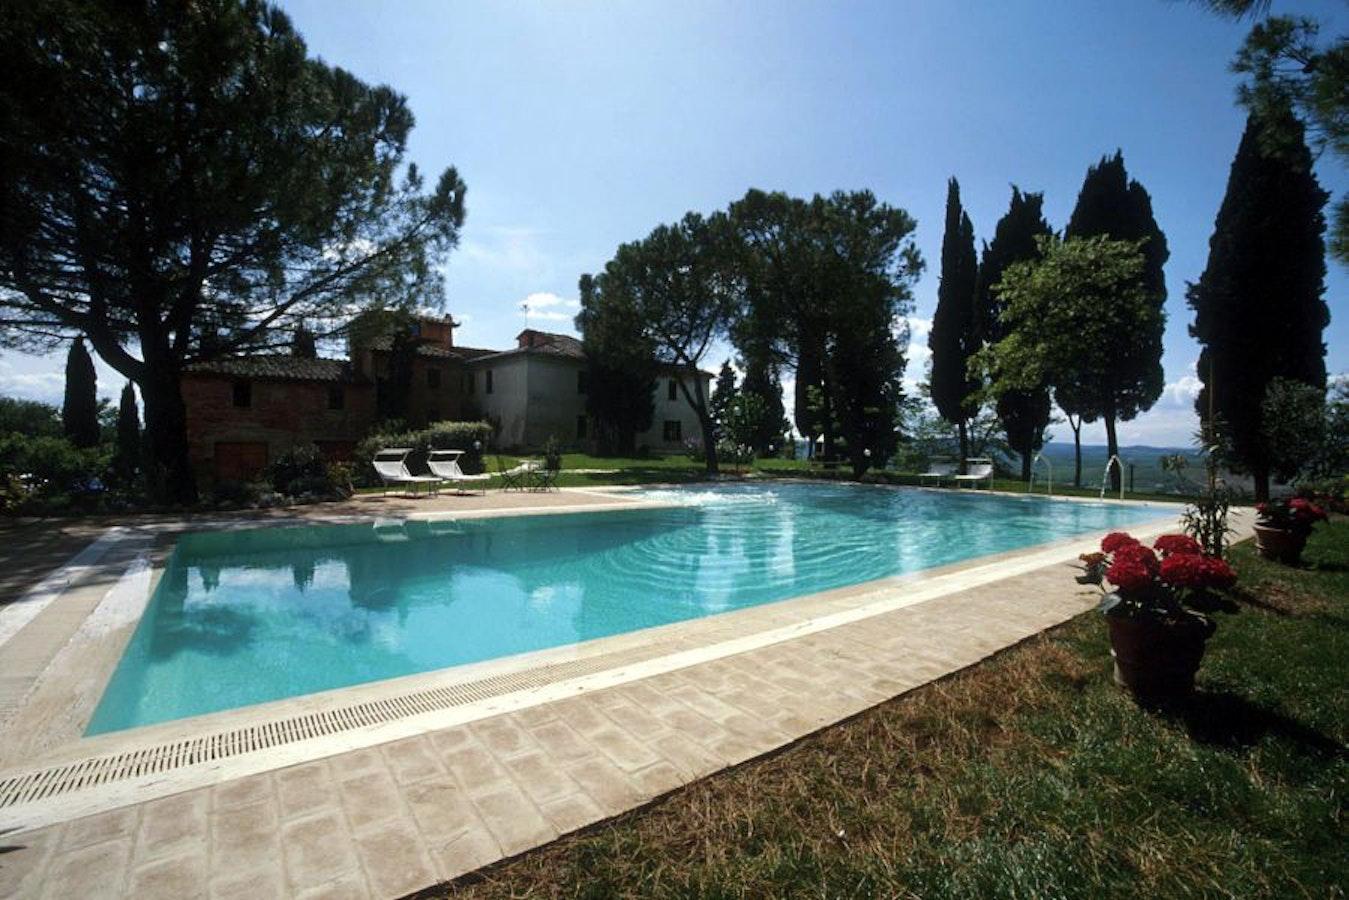 Agriturismo pieve sprenna buonconvento agriturismo con camere e appartamenti toscana - Agriturismo con piscina siena ...